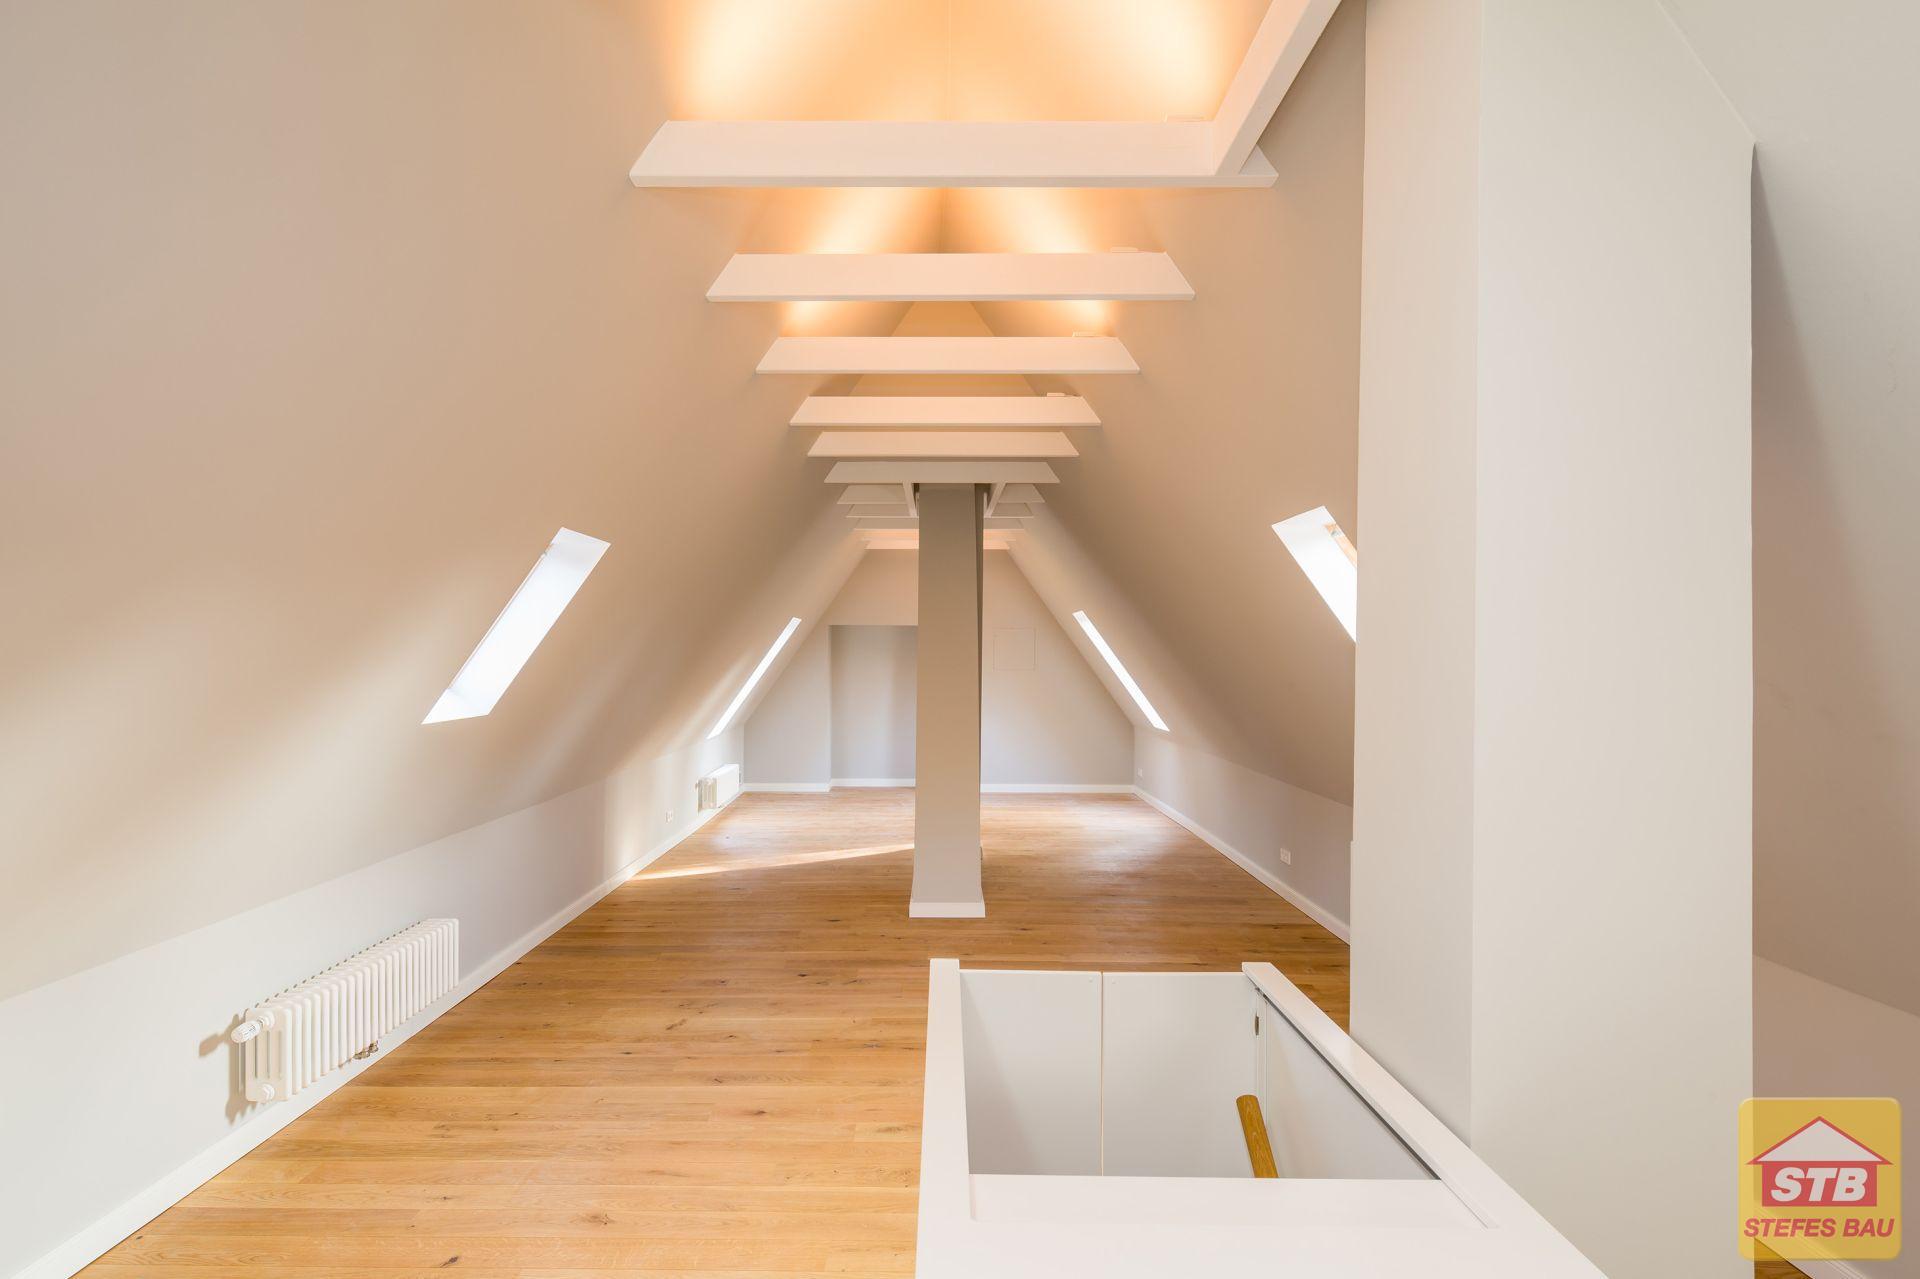 ausbau dachboden ausbau dachboden ansicht west with ausbau dachboden trendy ausbau des. Black Bedroom Furniture Sets. Home Design Ideas